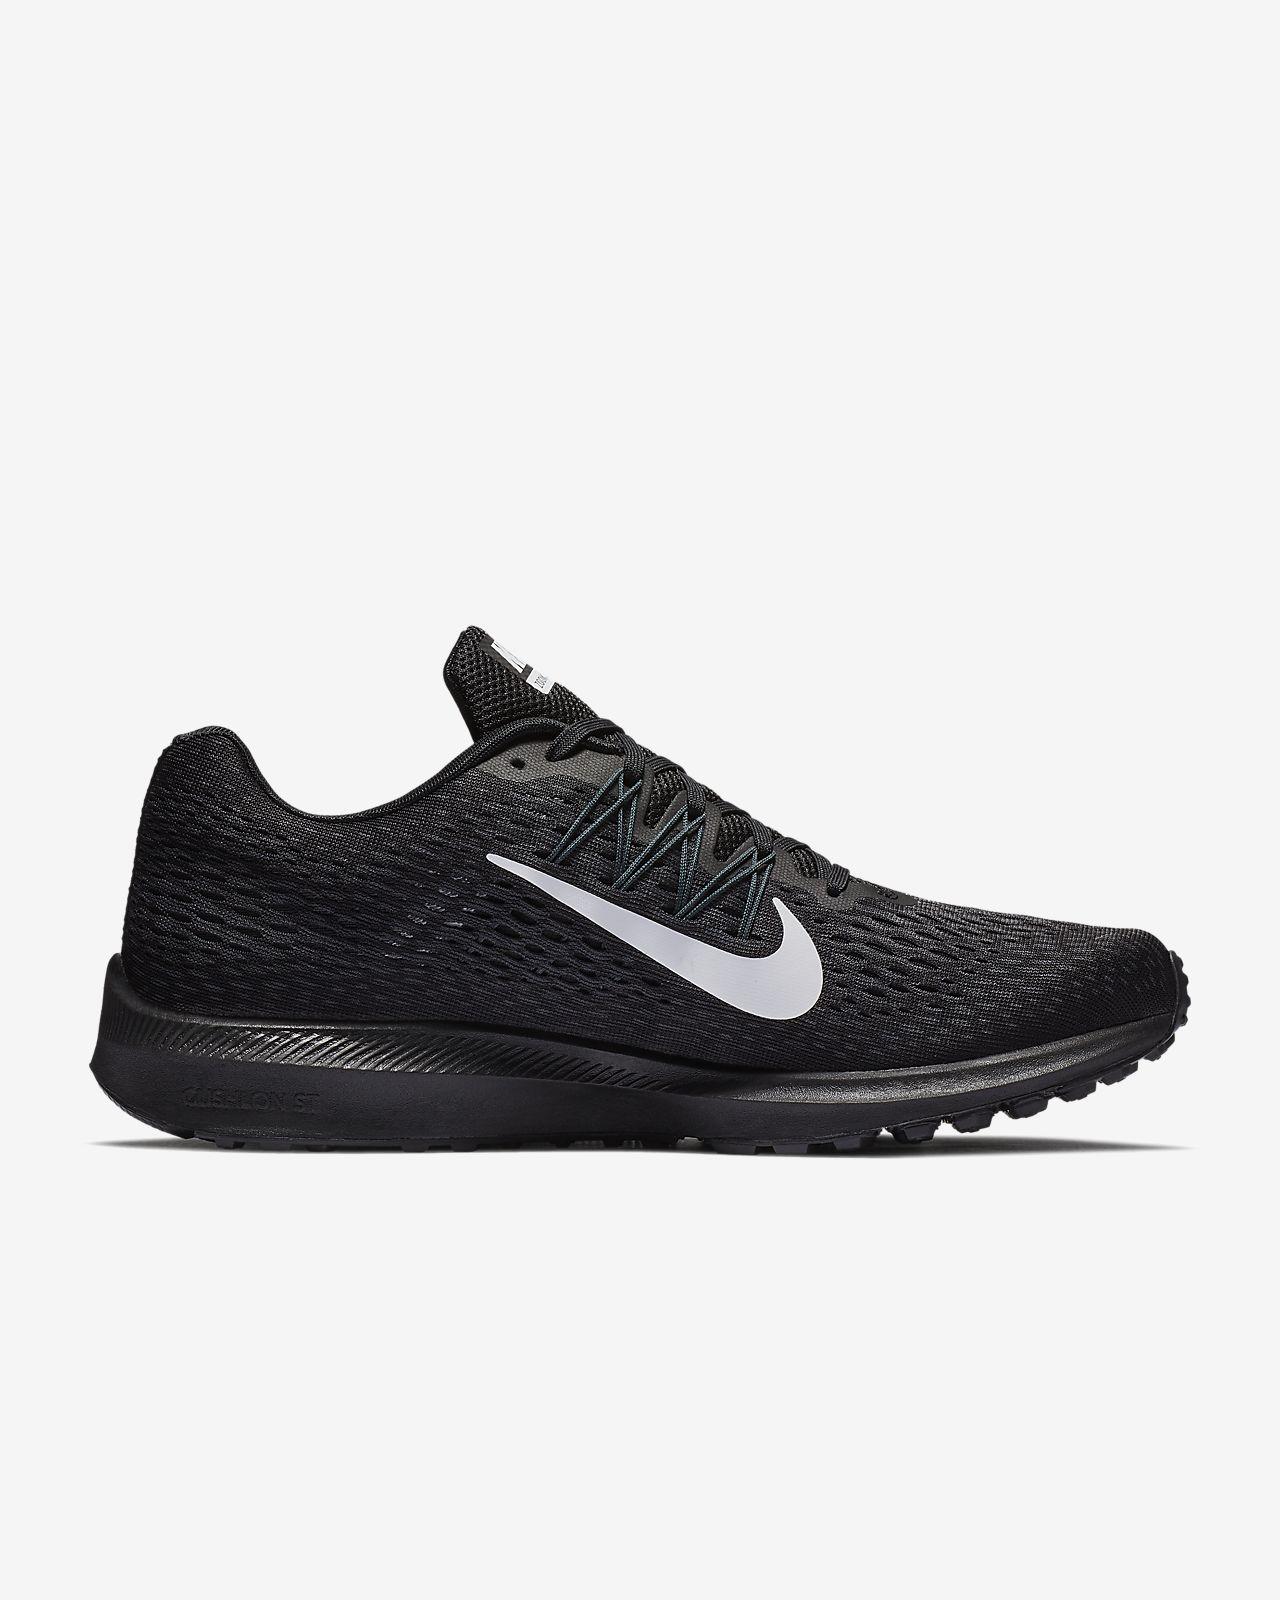 ... Nike Air Zoom Winflo 5 Men's Running Shoe